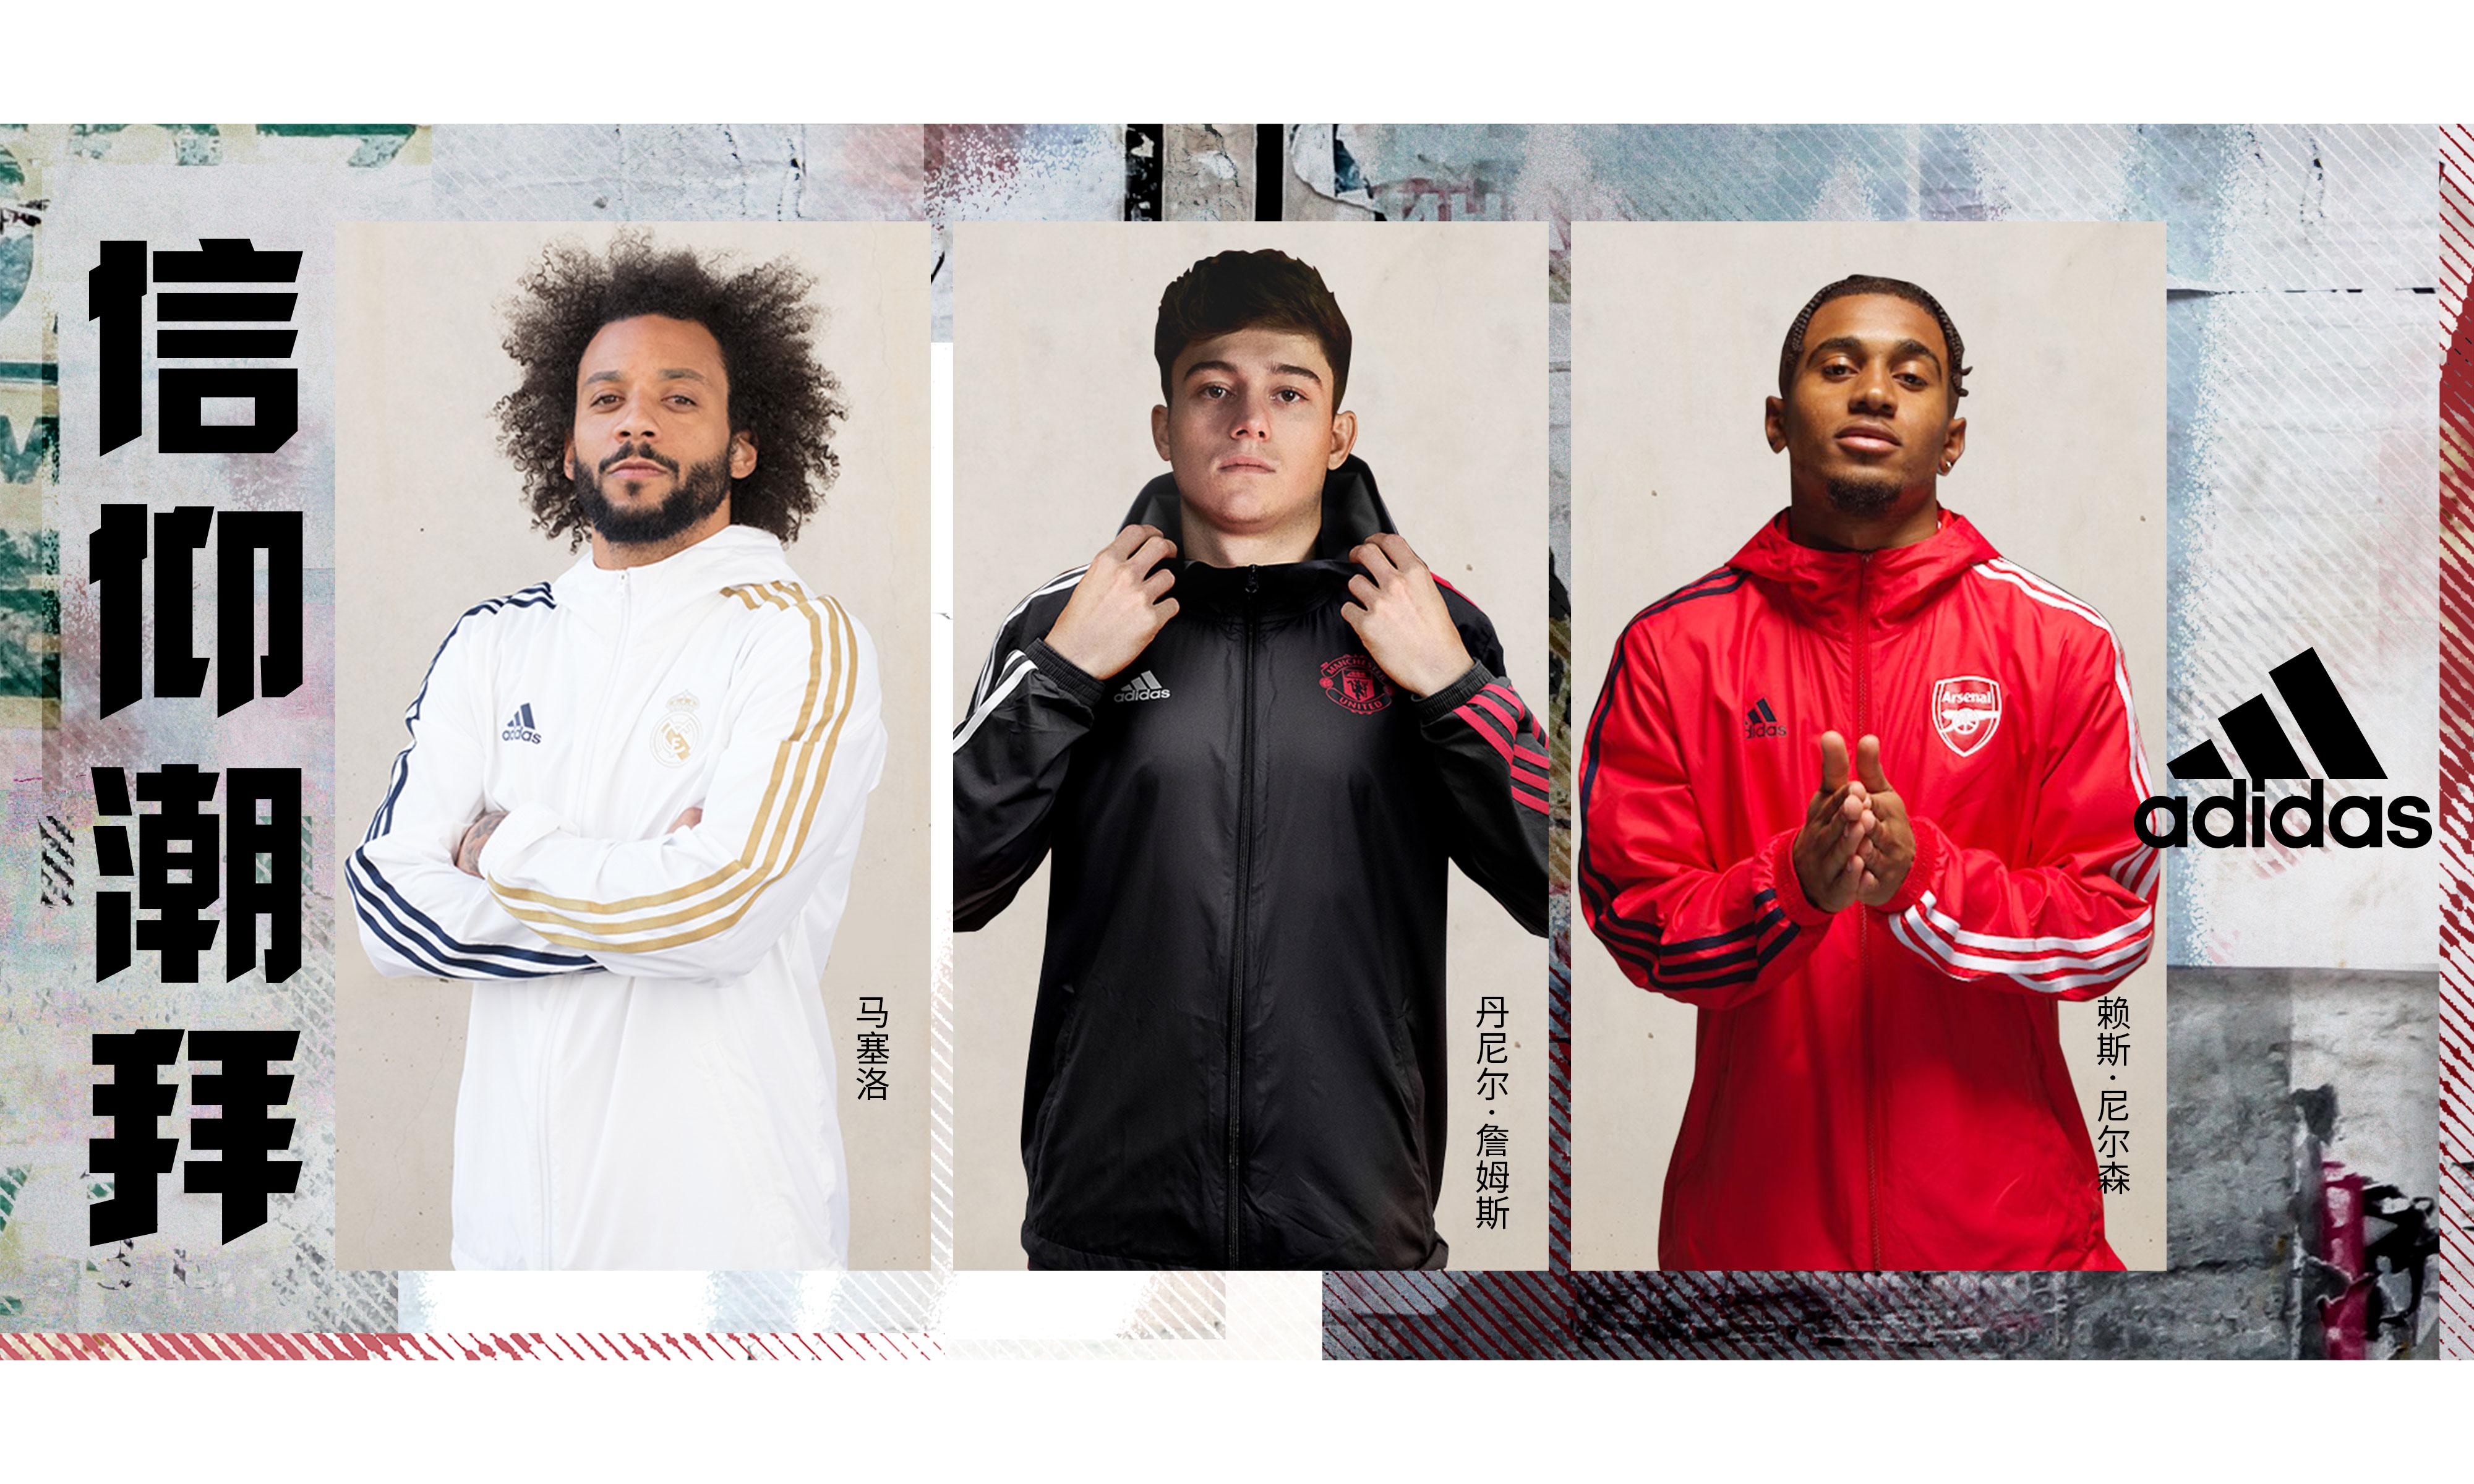 adidas Football 发布「信仰套装」俱乐部帽衫